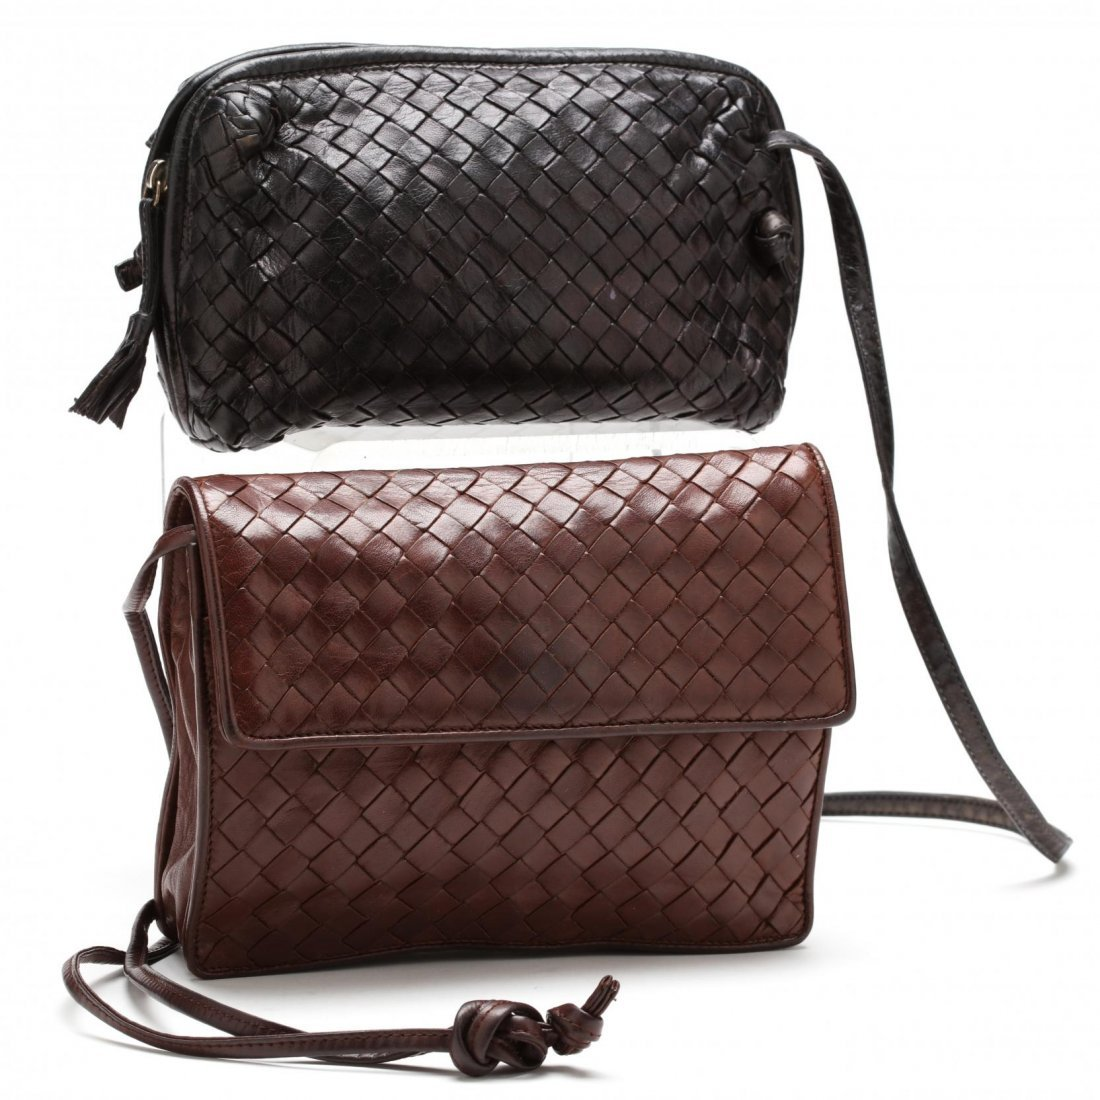 Two Cross-body Bags, Bottega Veneta